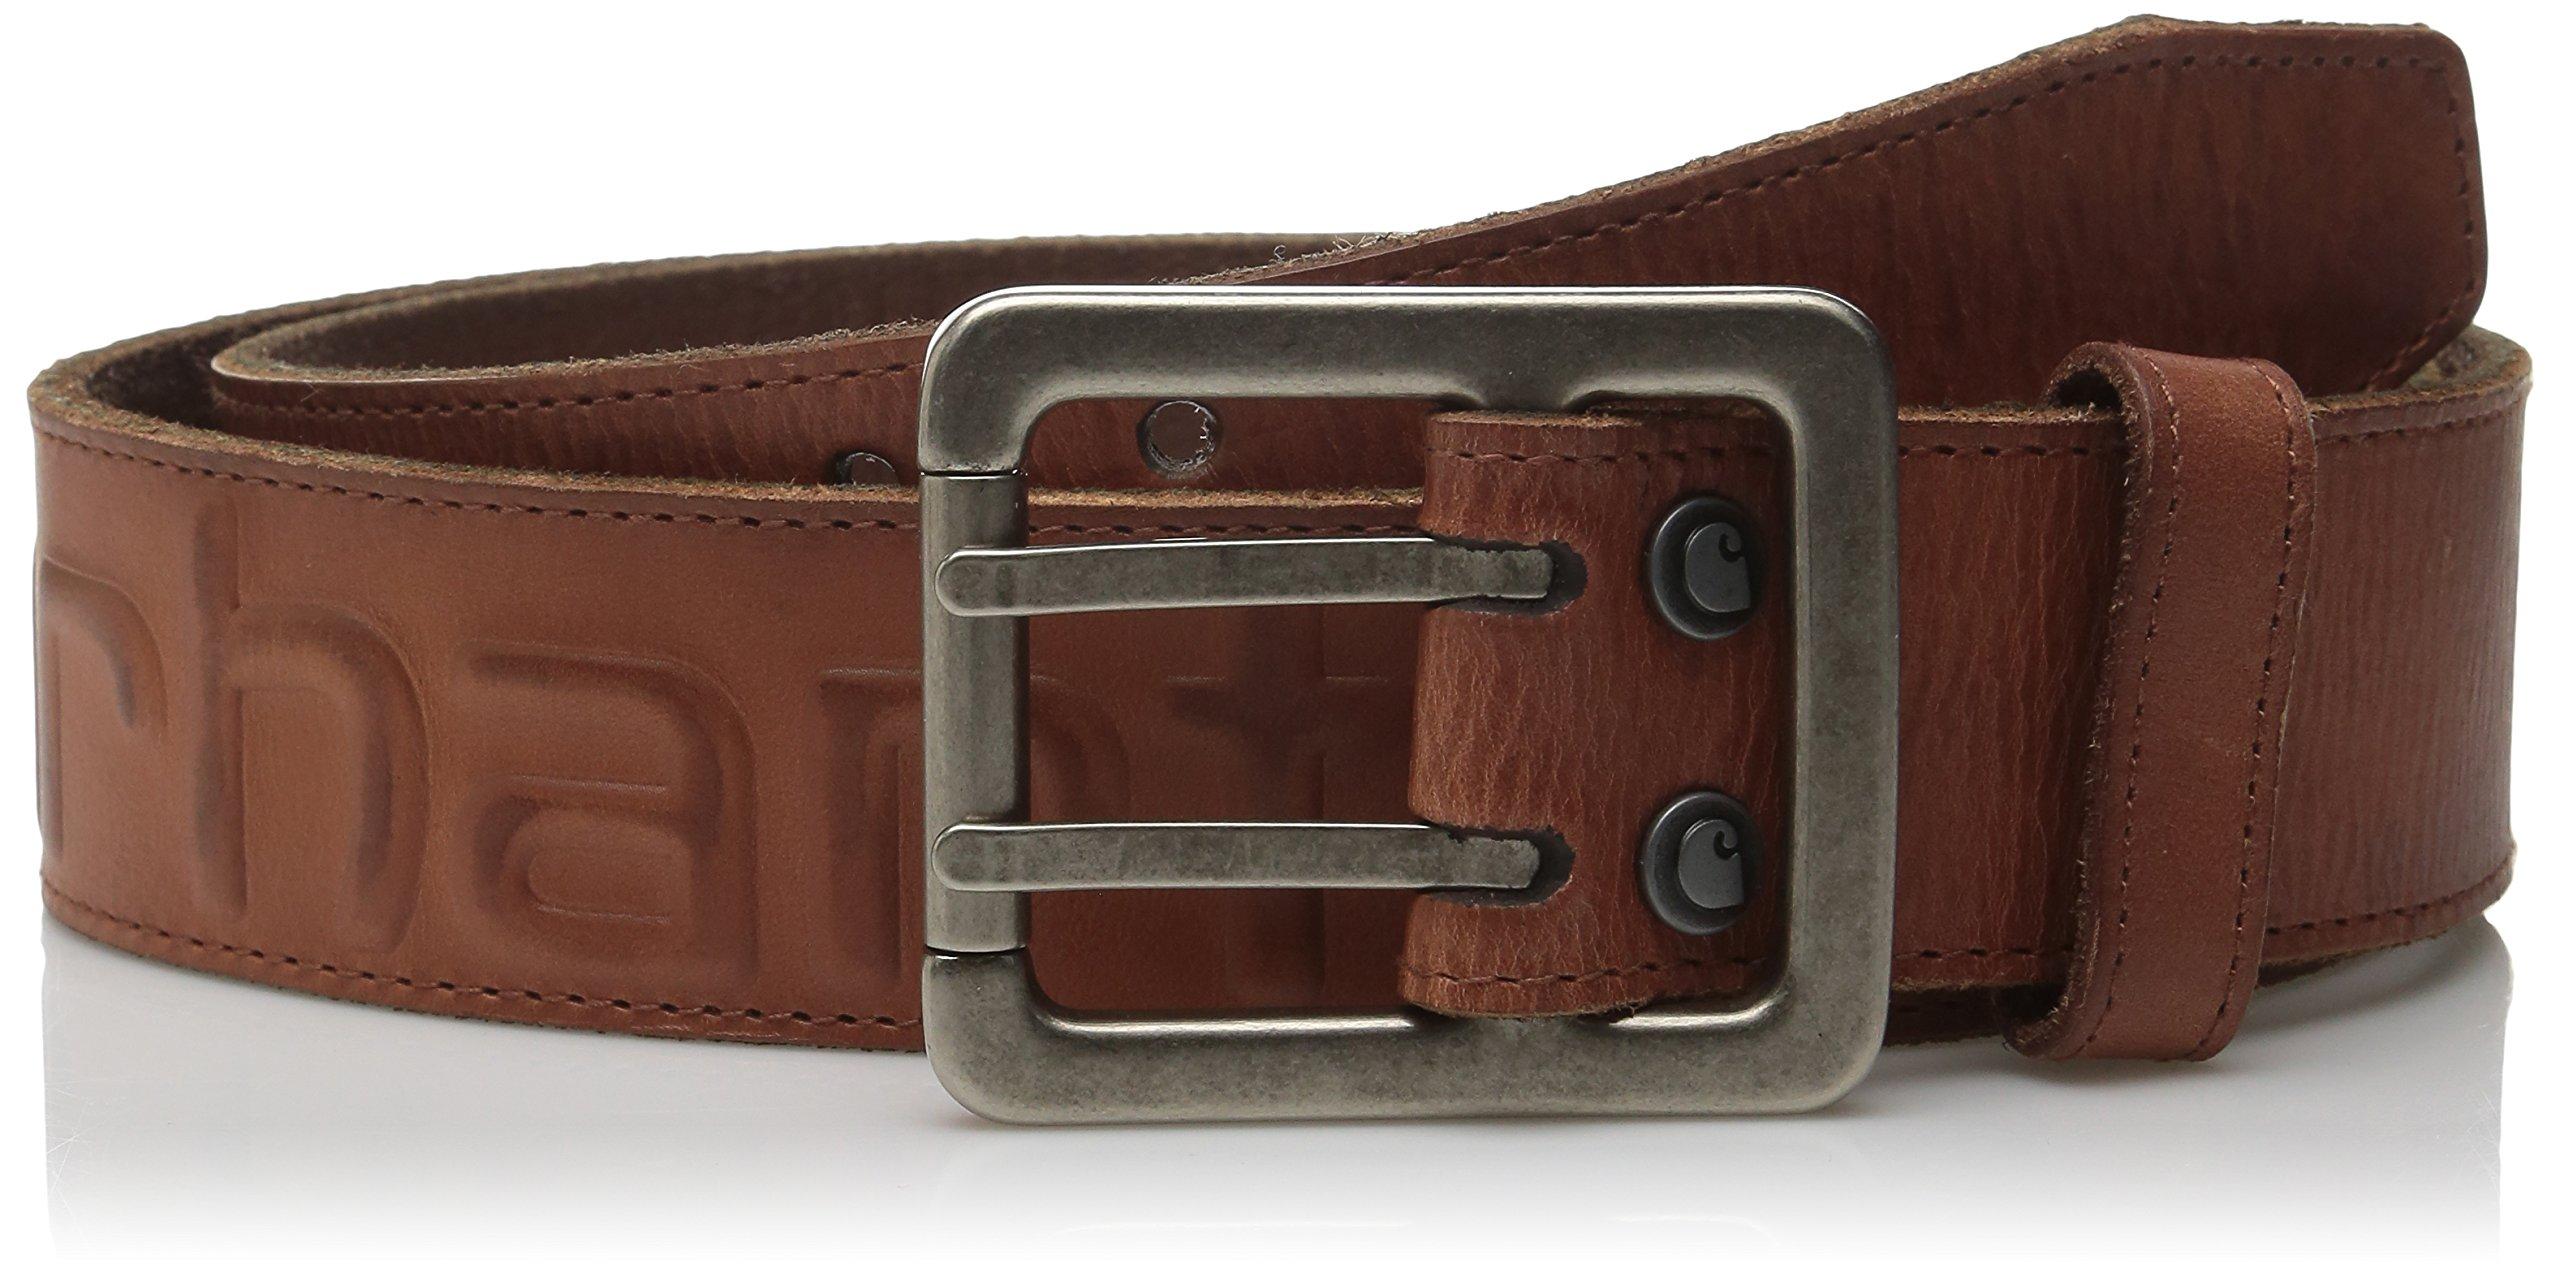 Carhartt Men's Logo Belt,Brown,36